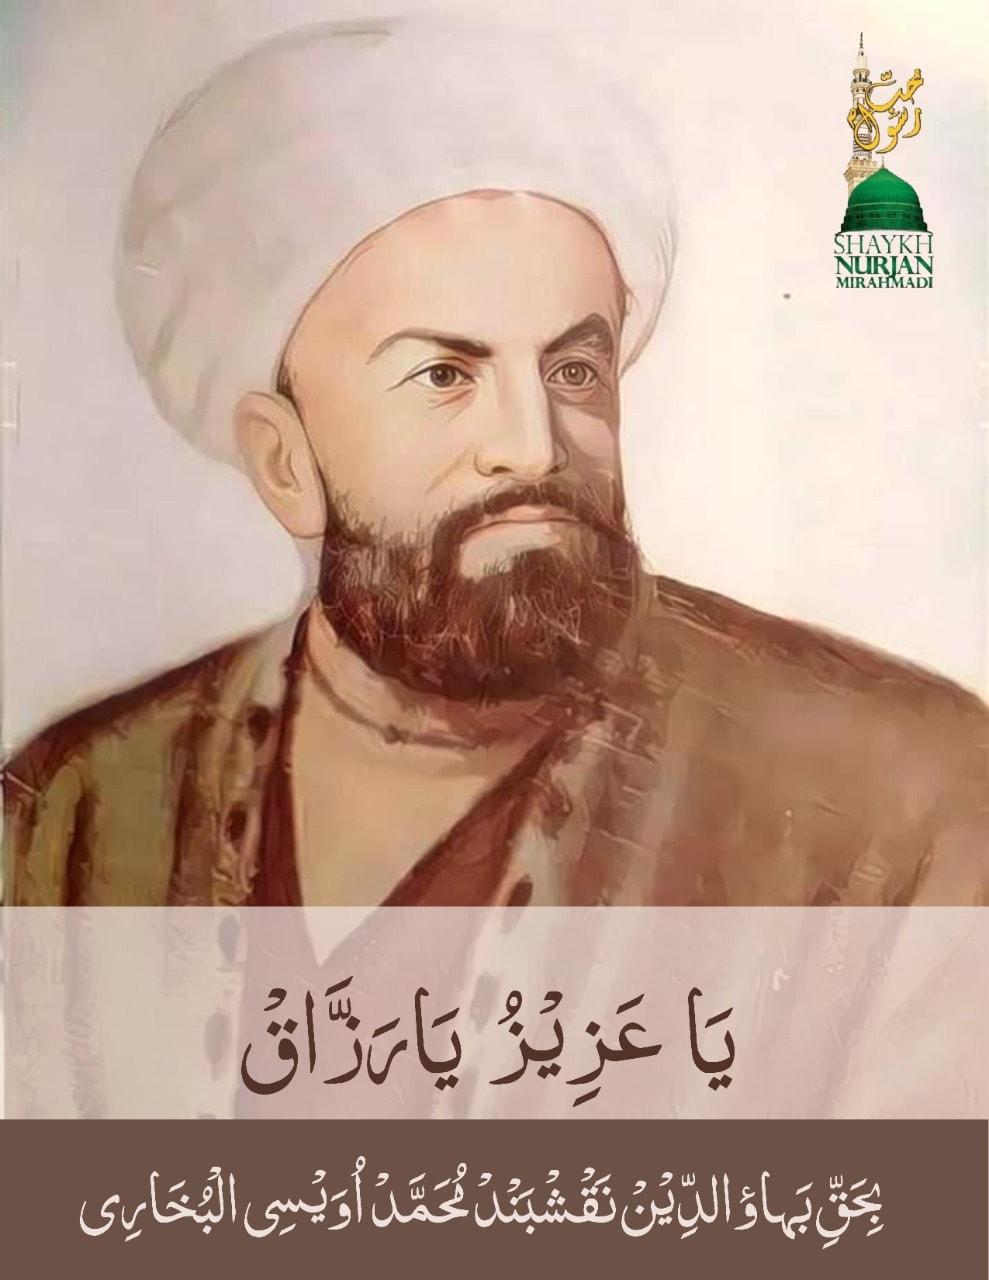 Bless your rizaq by reciting Ya Aziz o Ya Razzaq Bi Haqqi Baha Uddin Naqshband M...